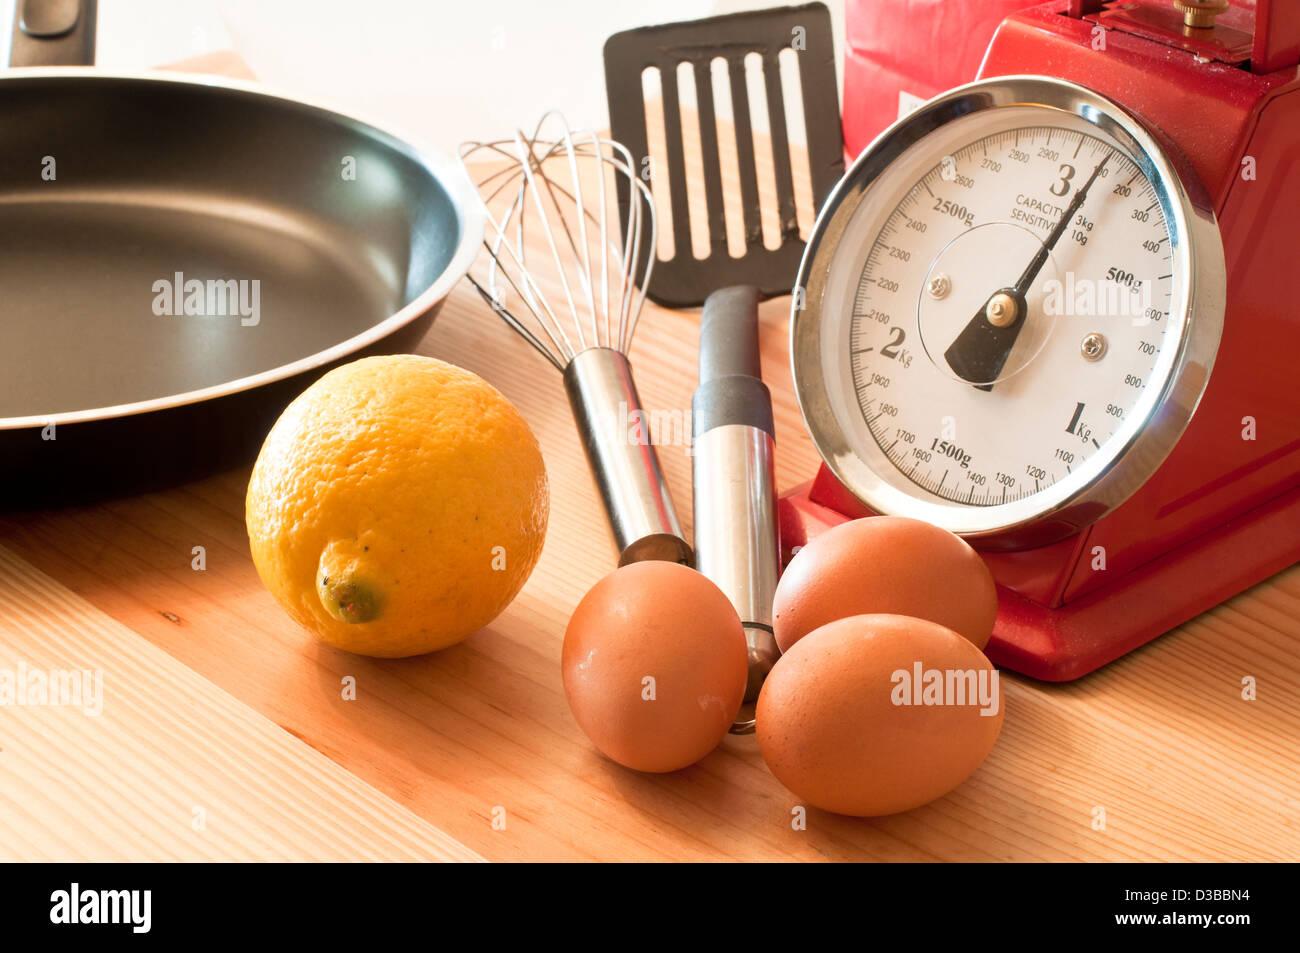 Baking - Stock Image